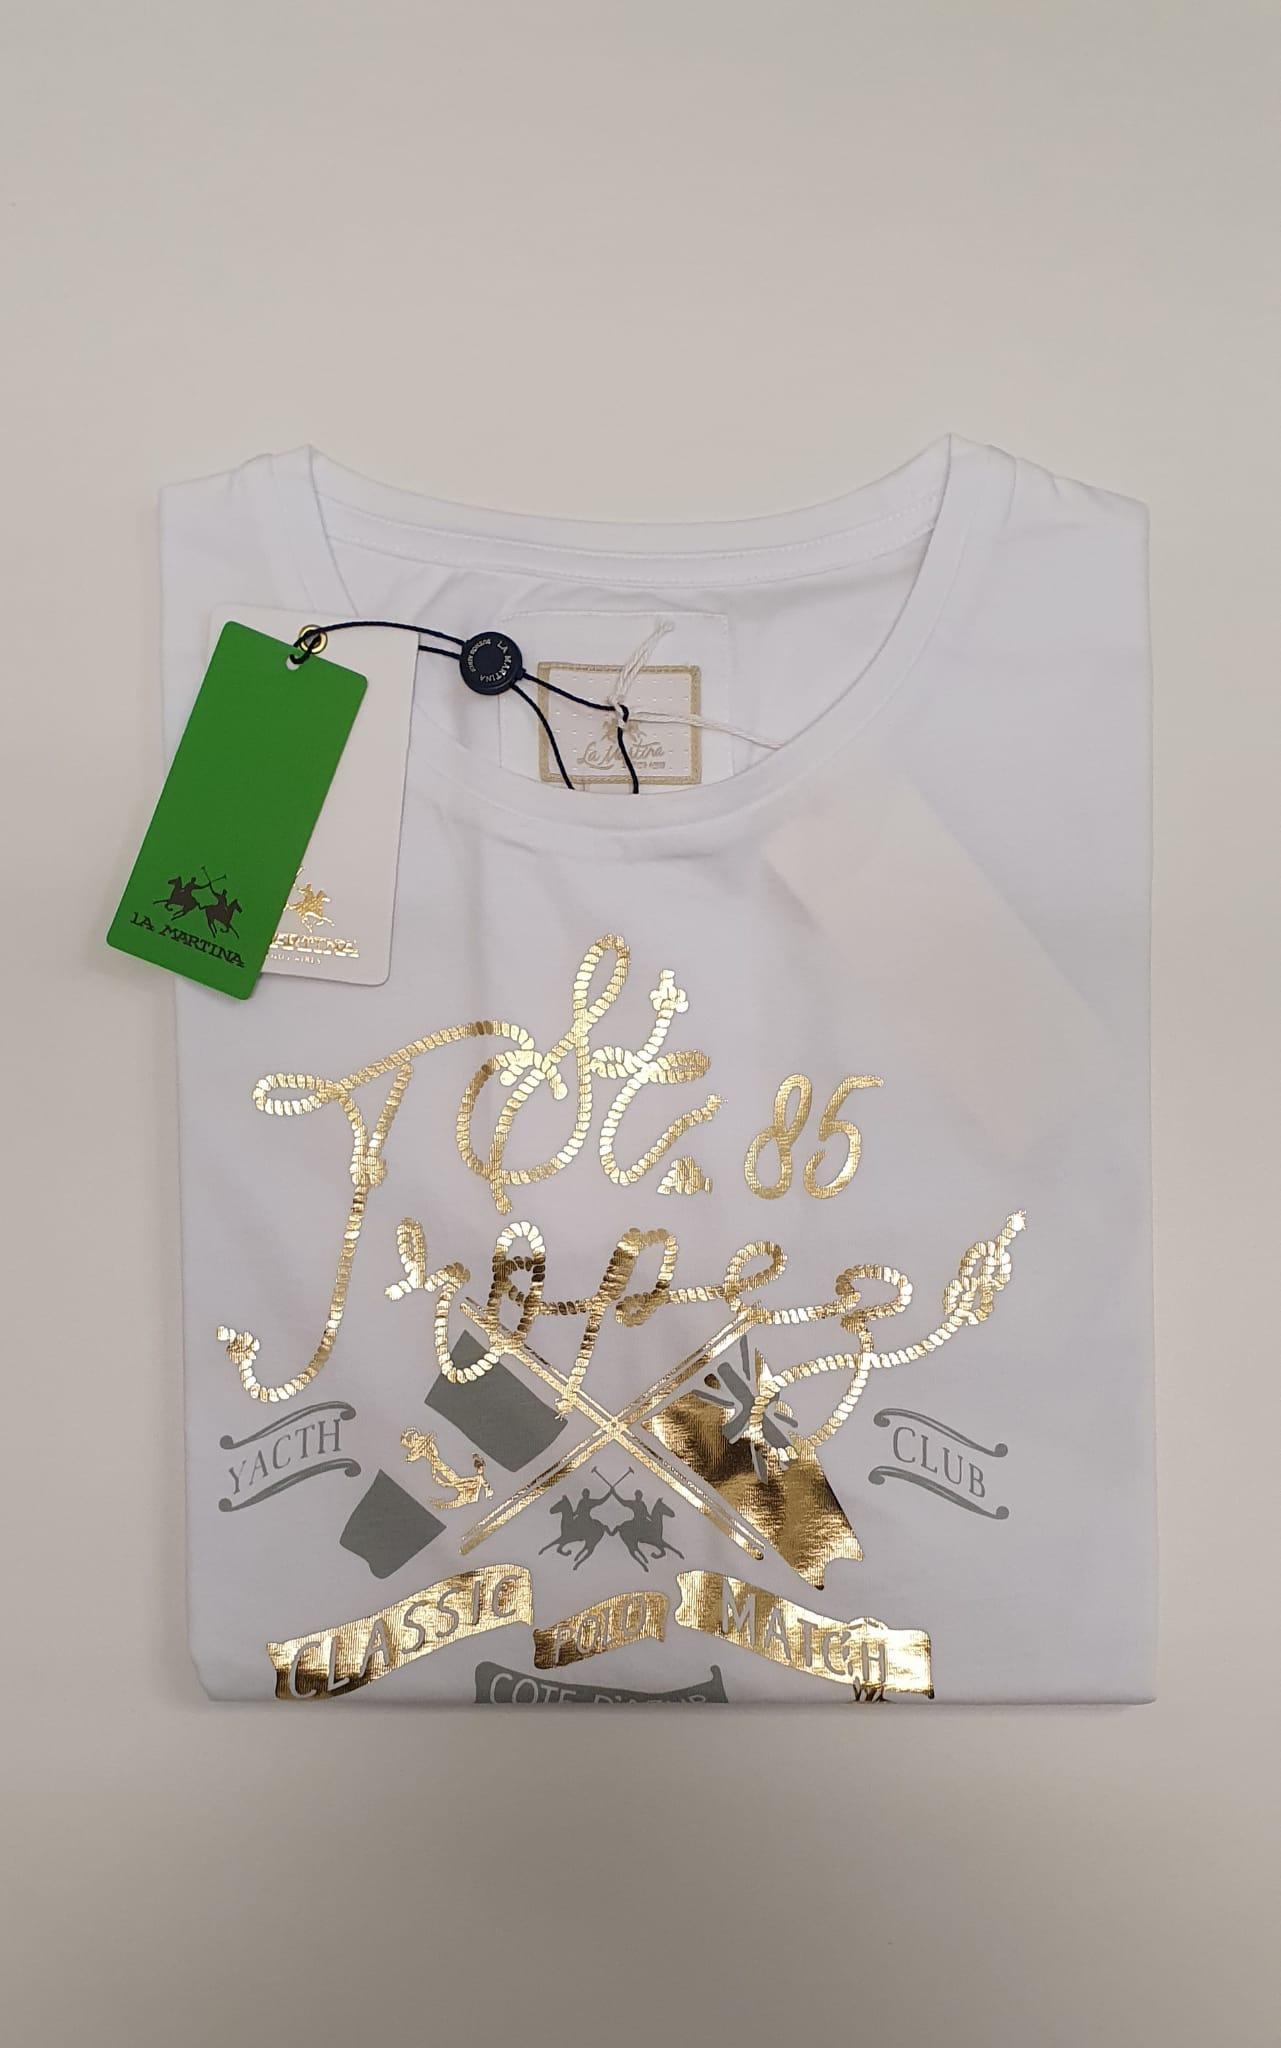 T-Shirt La Martina Viscosa in Colone 100% Regular Fit Bianco